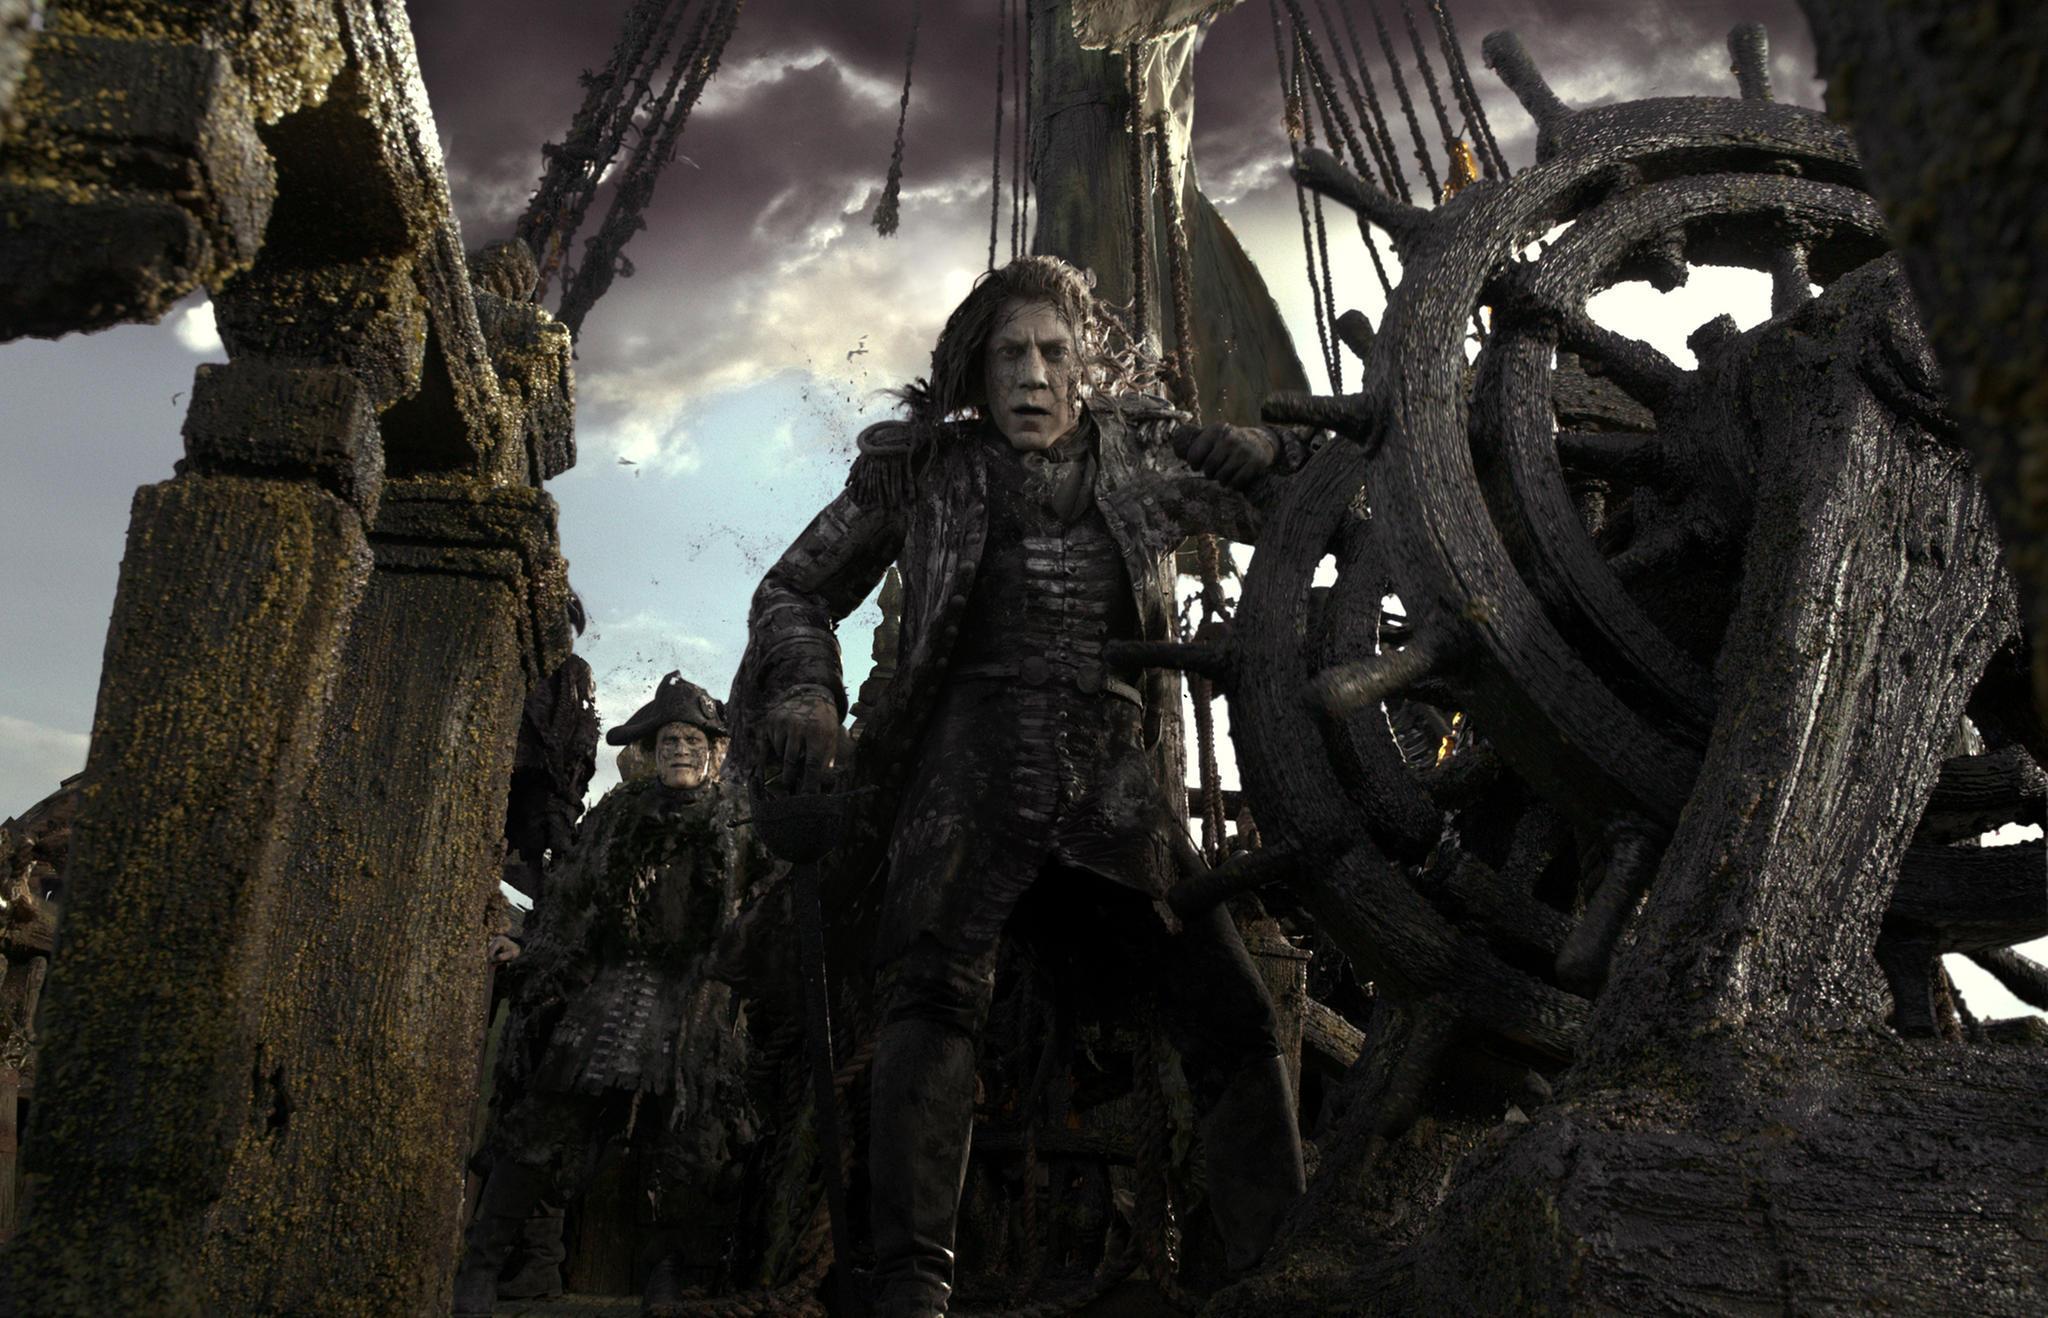 Sparrows finsterer Gegenspieler: Javier Bardem ist Captain Salazar (Szenenbild)